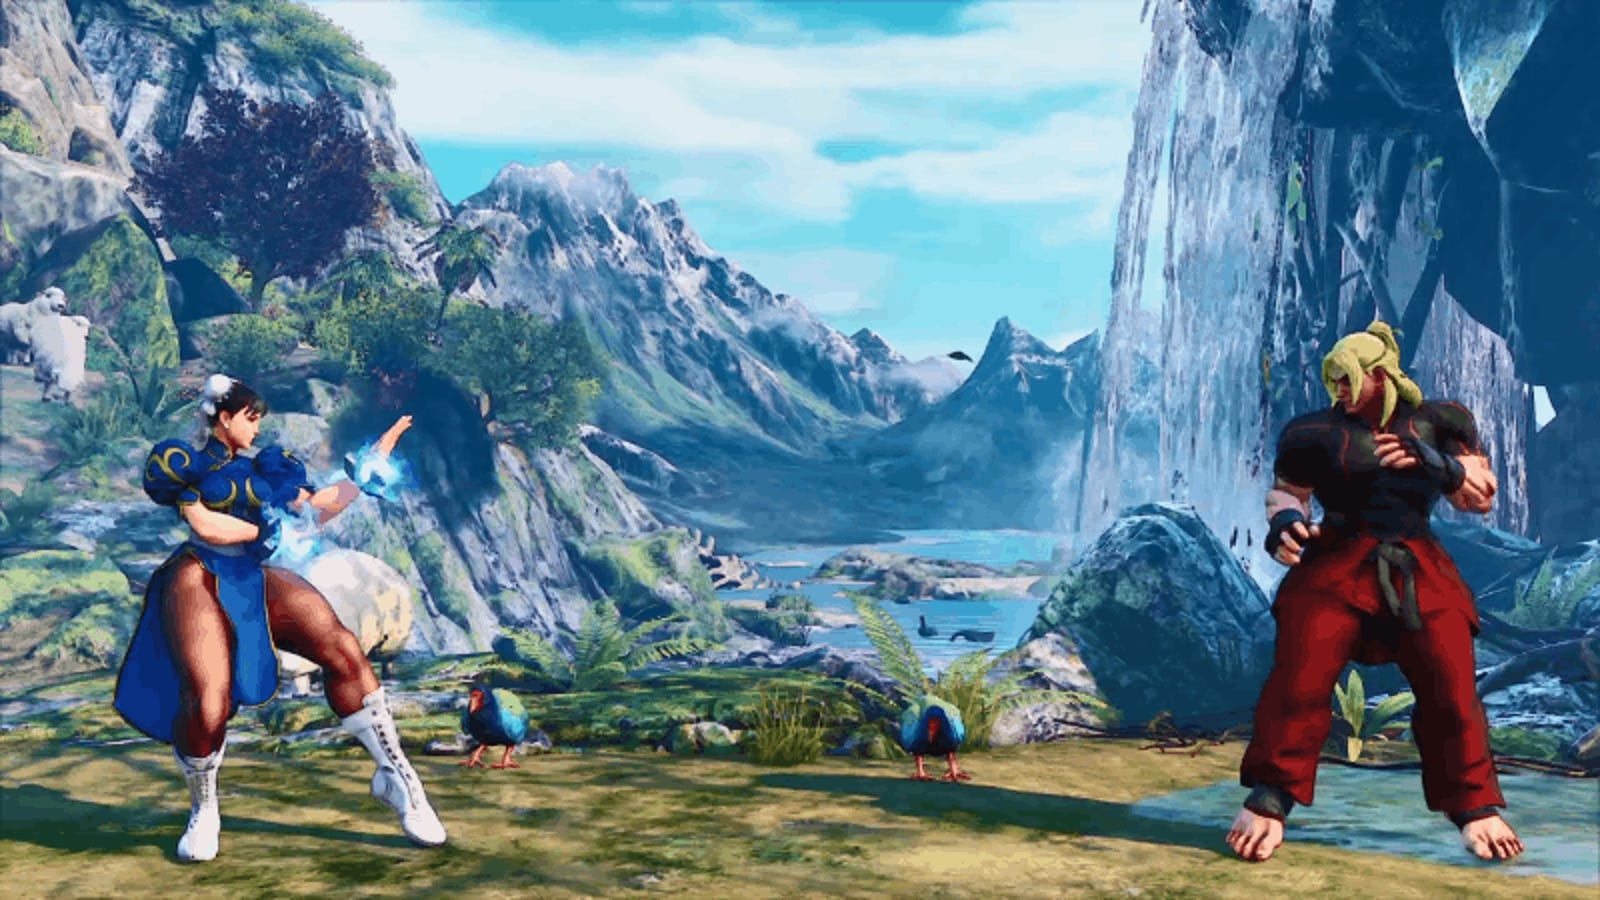 New Street Fighter V Glitch Lets Chun-Li Float Off Into Space